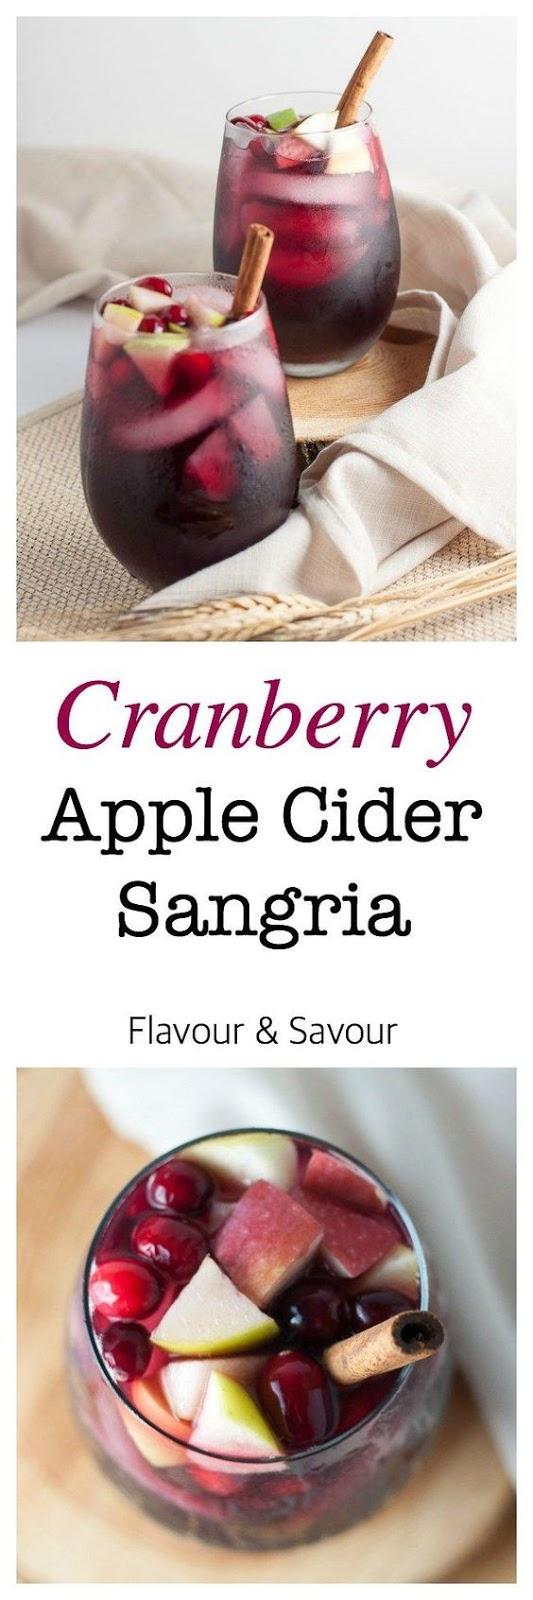 Cranberry Apple Cider Sangria